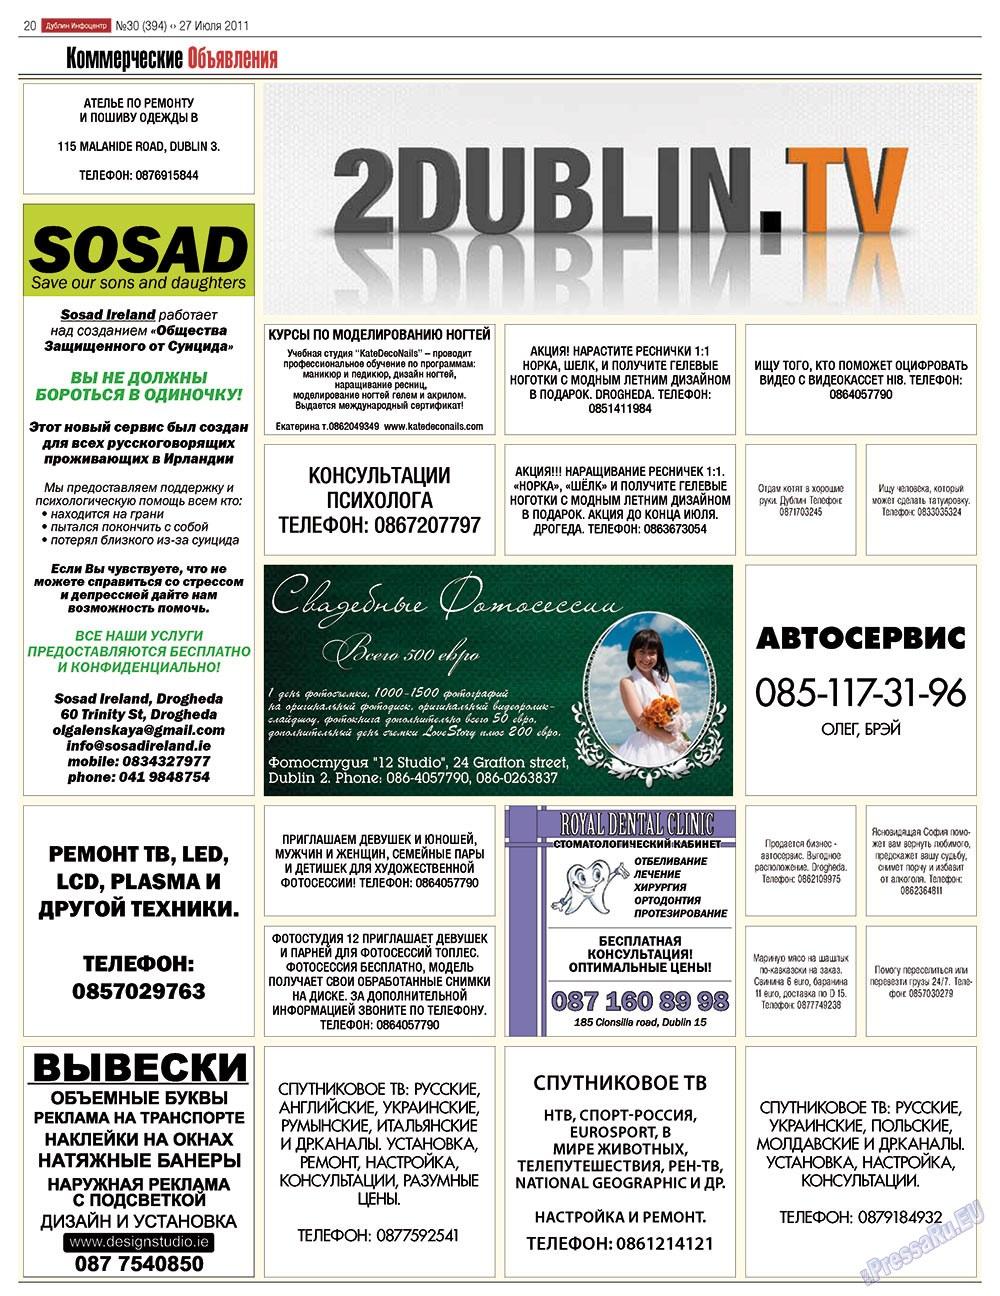 Дублин инфоцентр (газета). 2011 год, номер 30, стр. 20